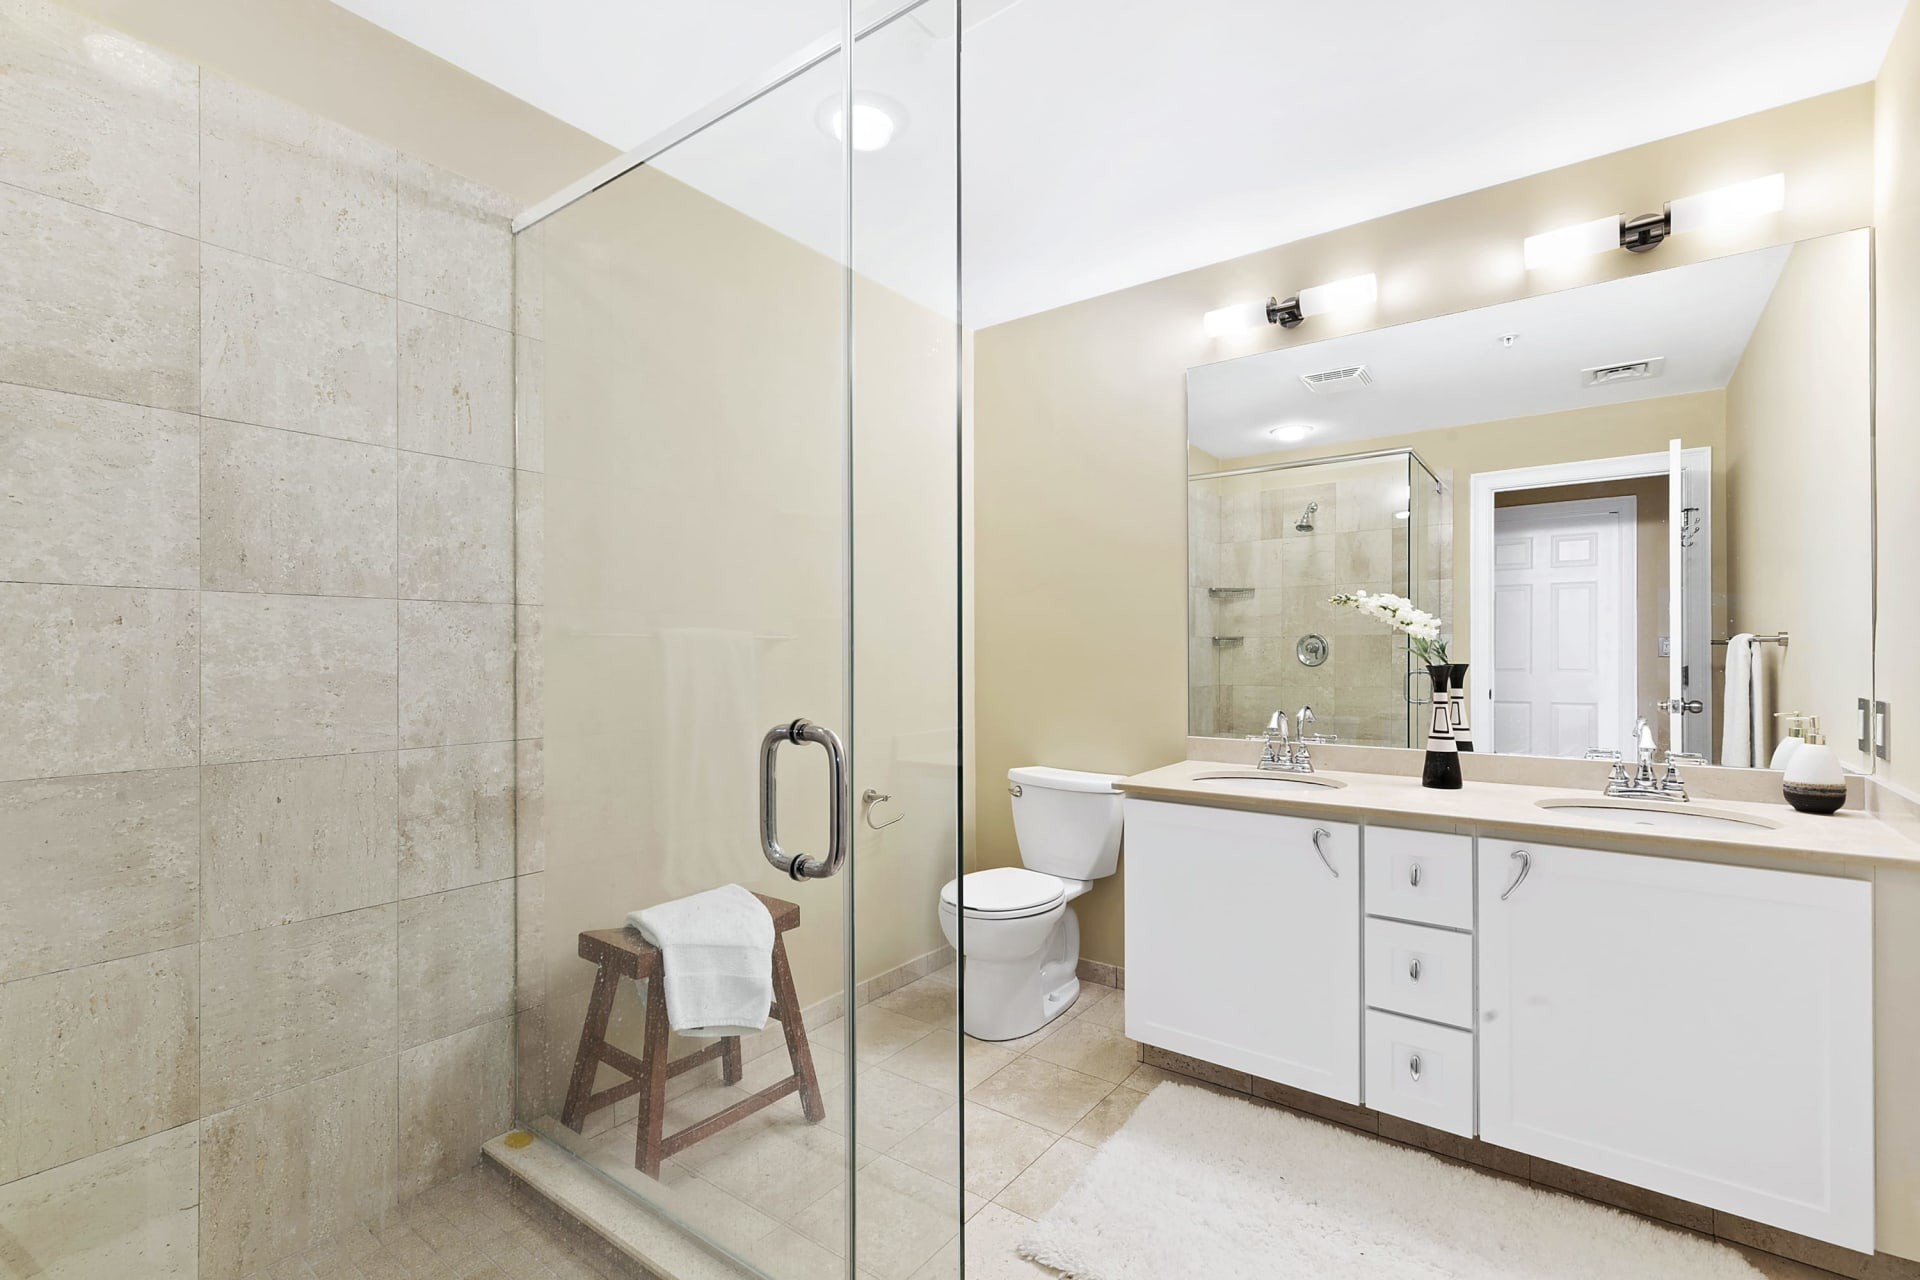 1 Russell Street PH 403—Cambridge Luxury Condo photo